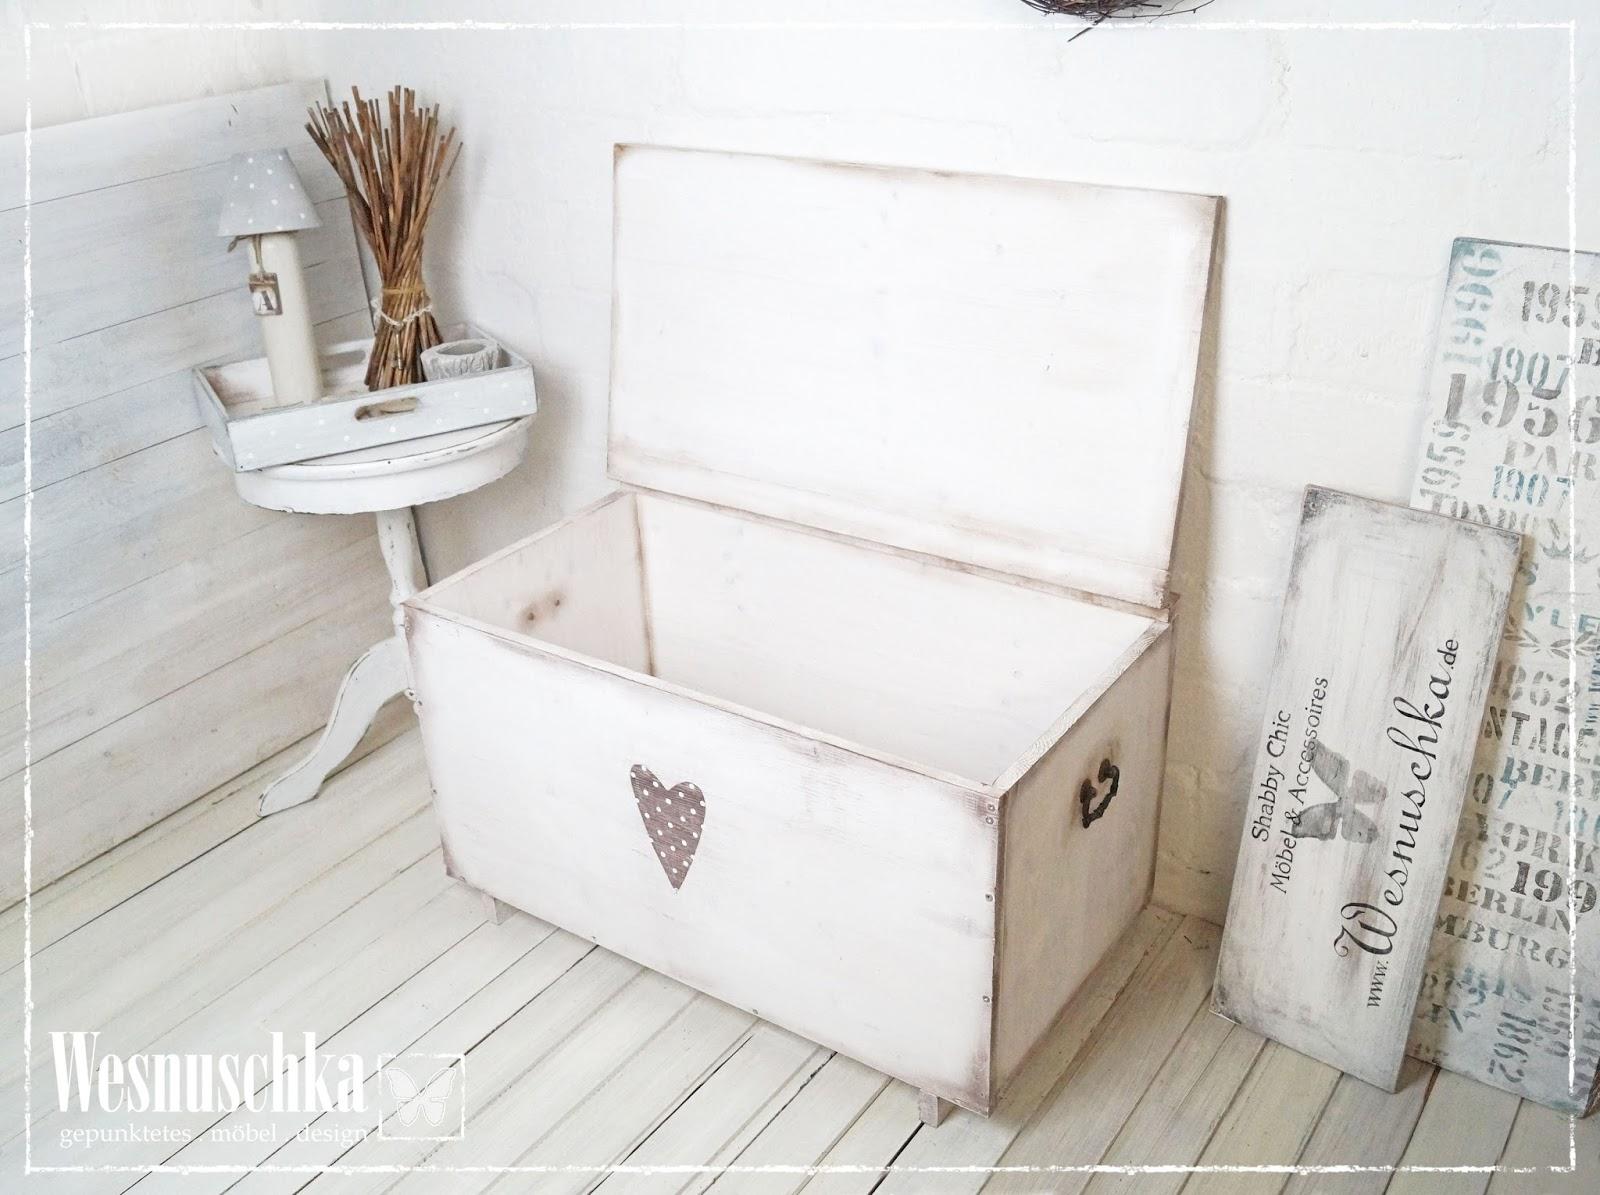 hochglanz einbauk che edel. Black Bedroom Furniture Sets. Home Design Ideas